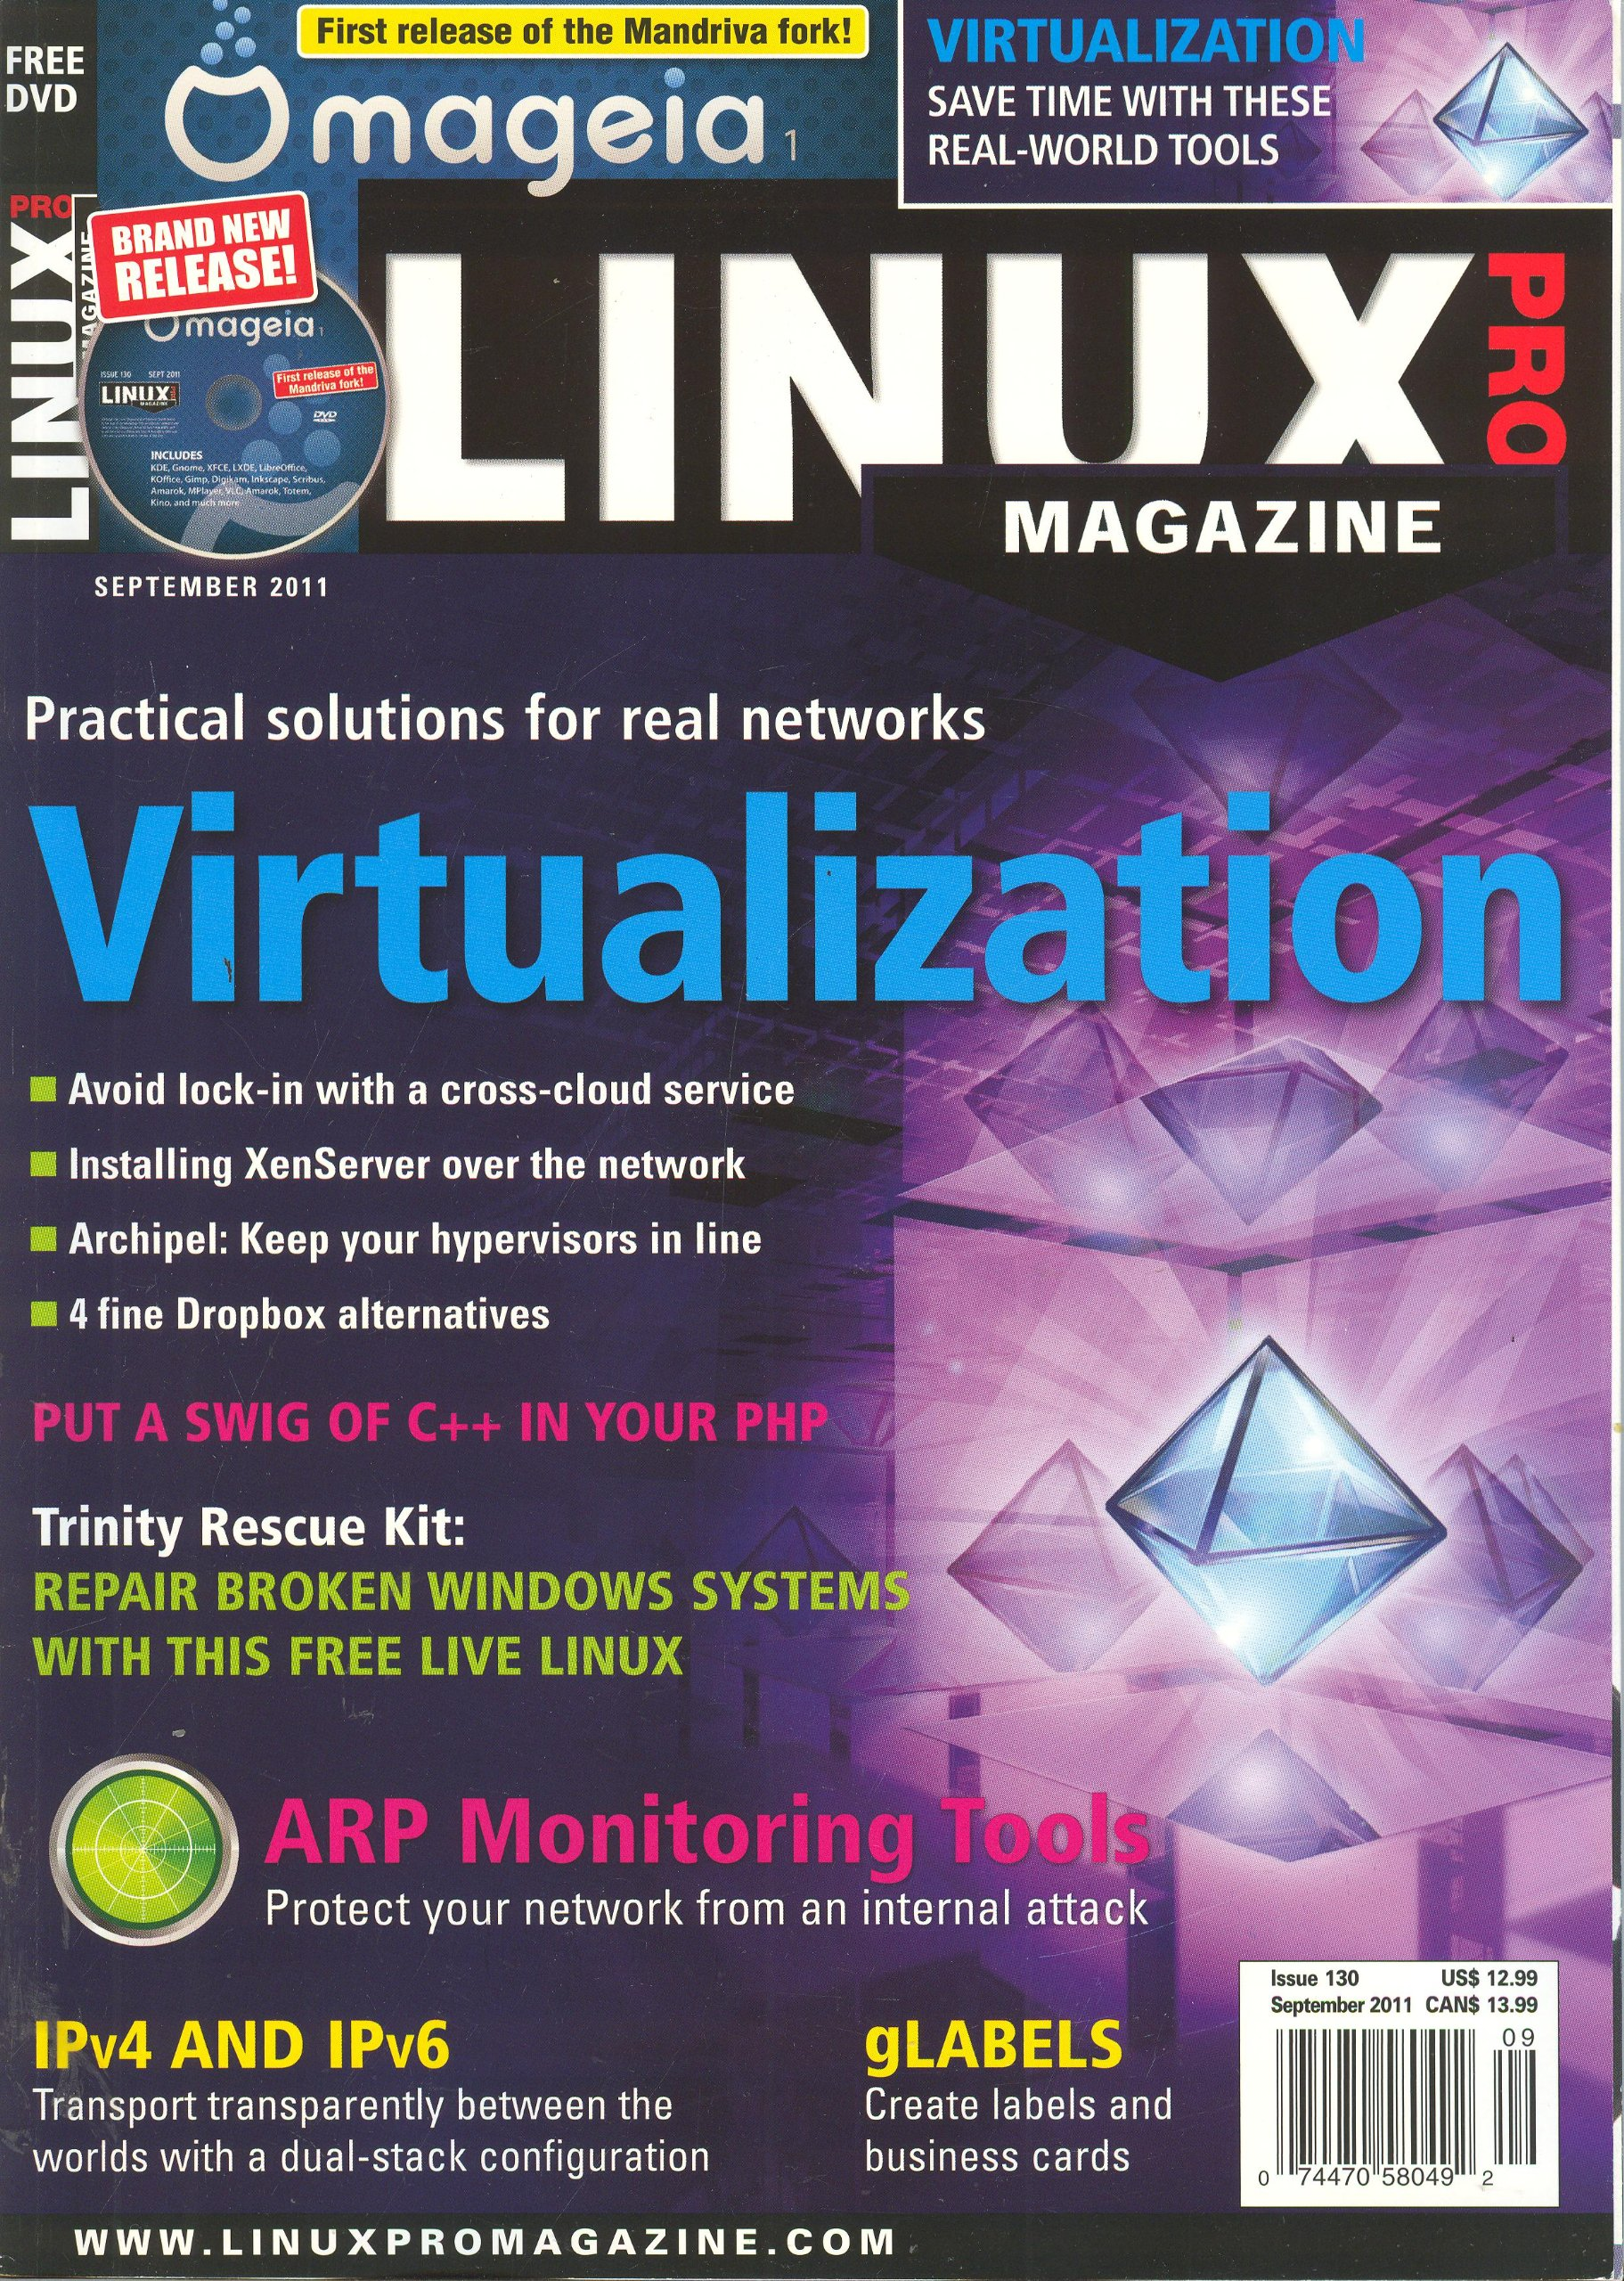 Linux Pro Magazine Issue 130 September 2011: Joe Casad